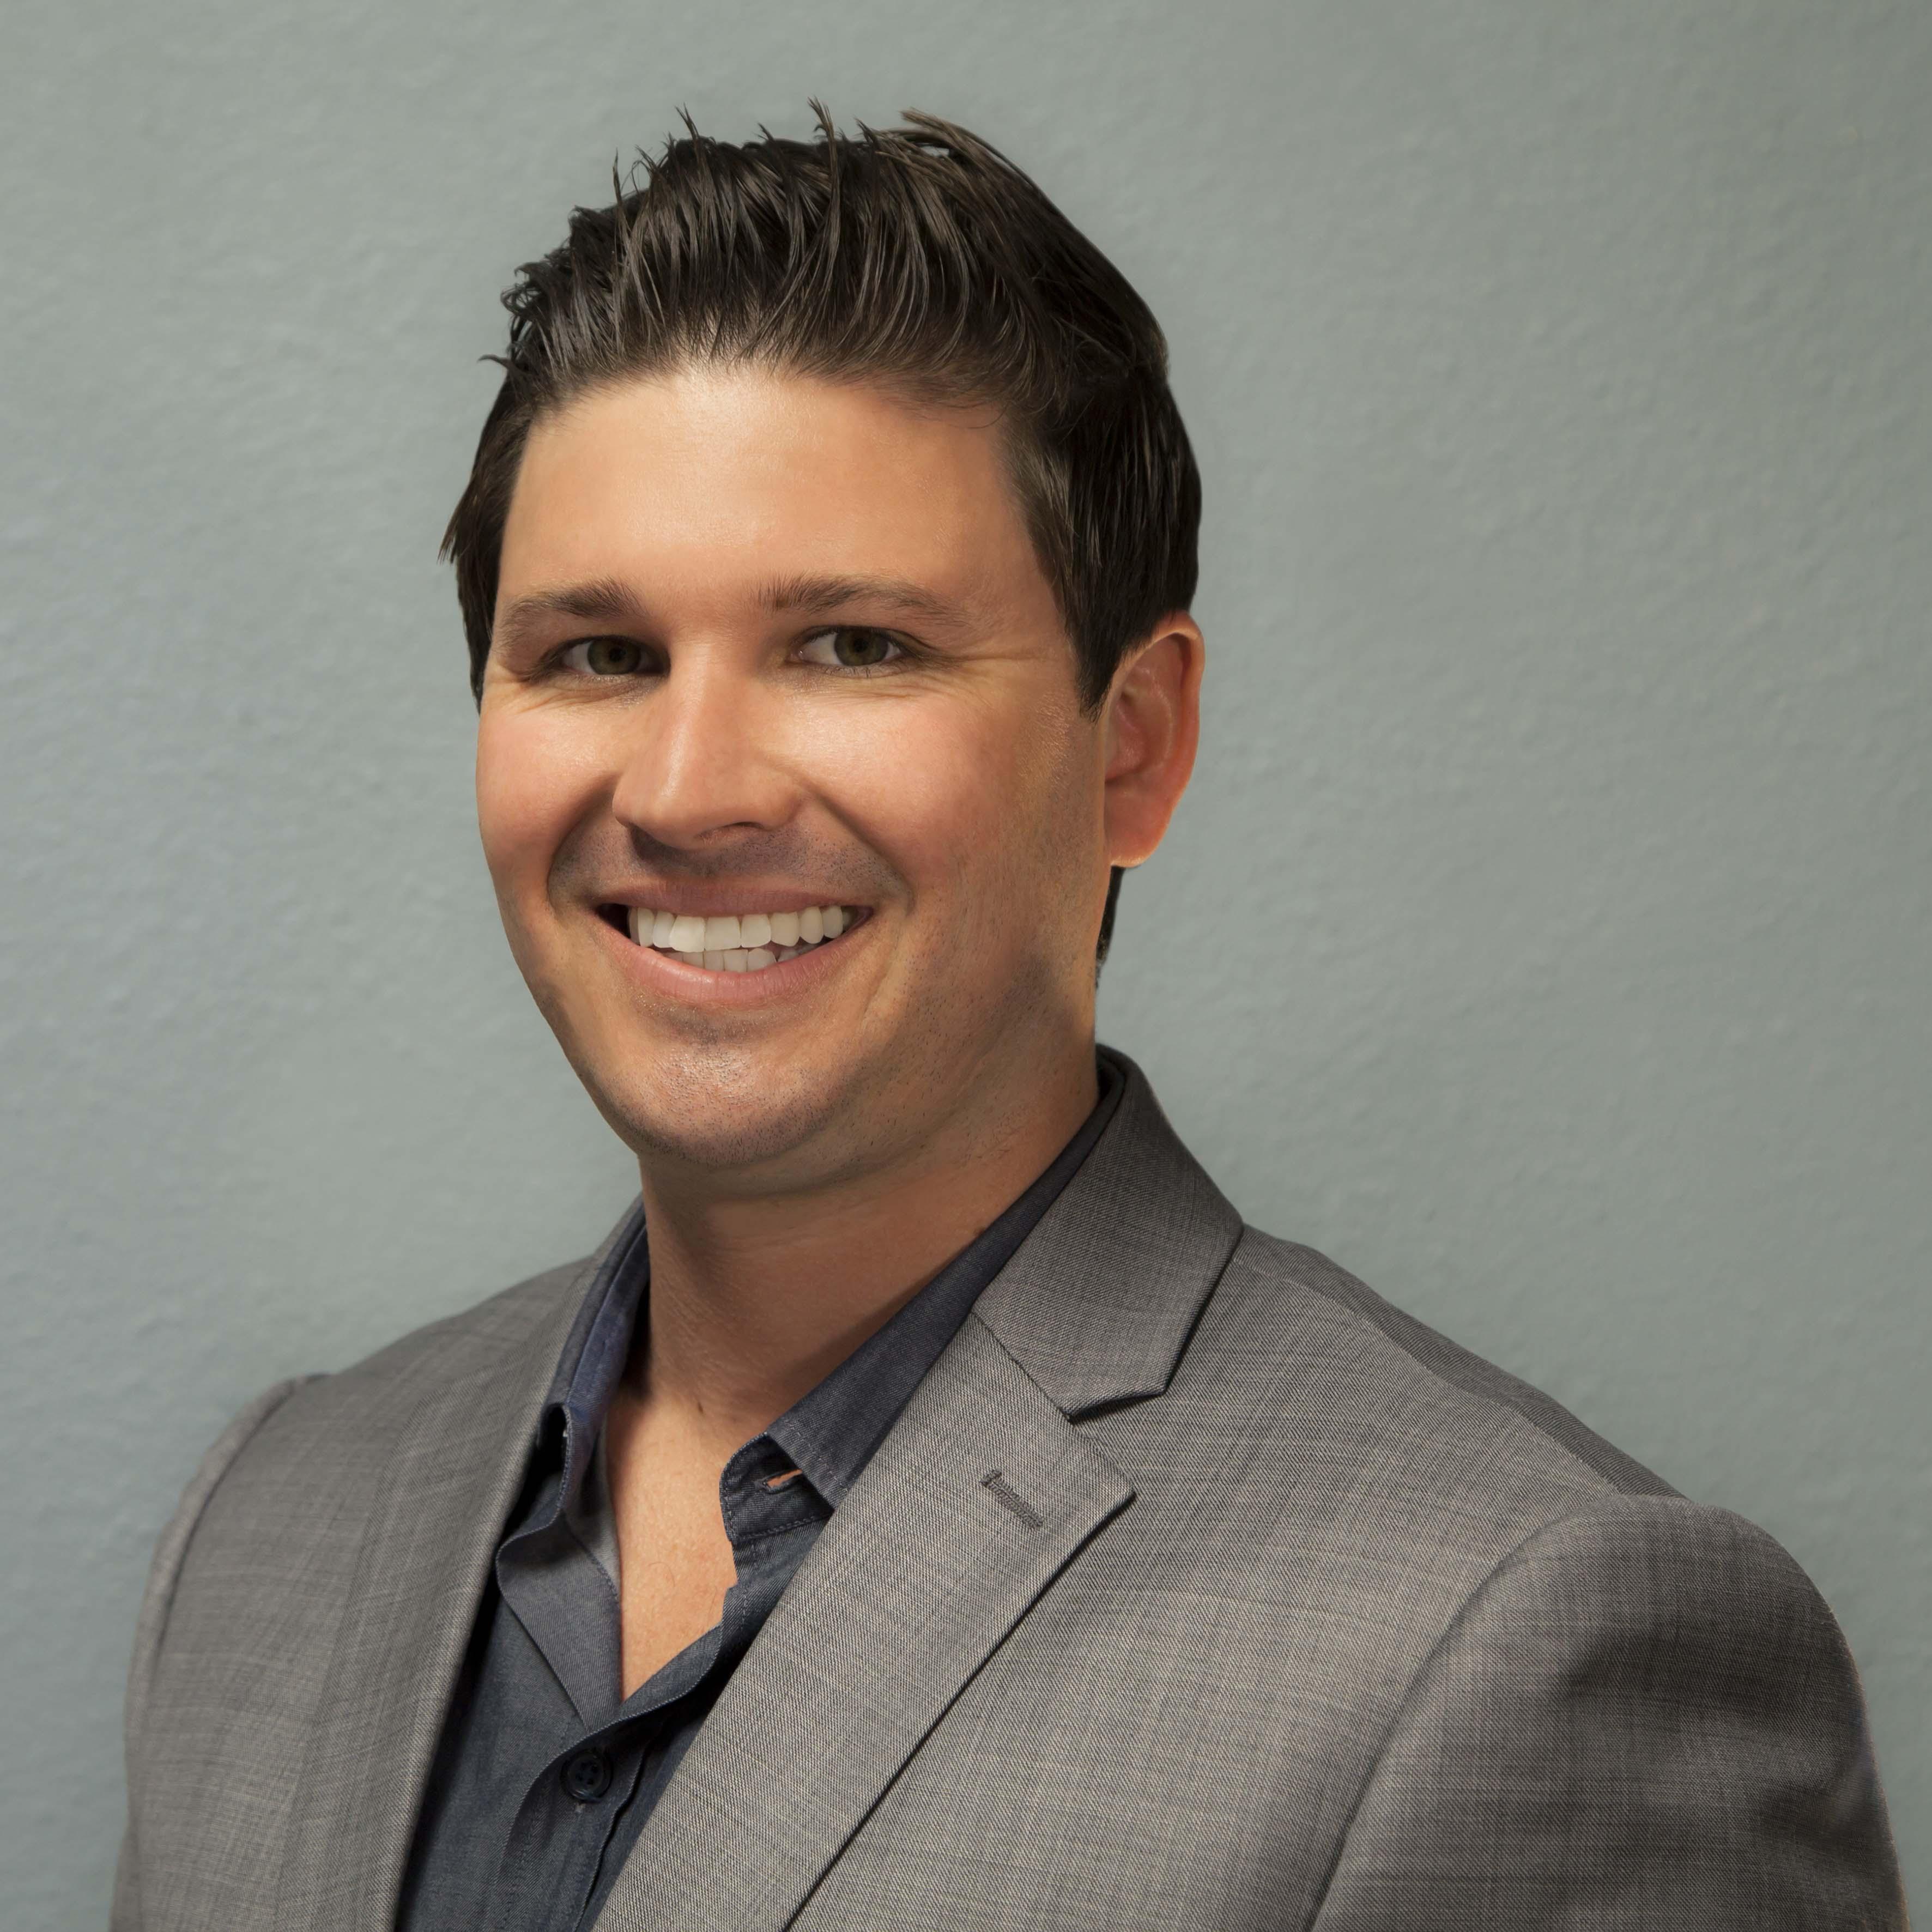 Jake Schultz, Senior Digital Marketing Manager, Visit Huntington Beach